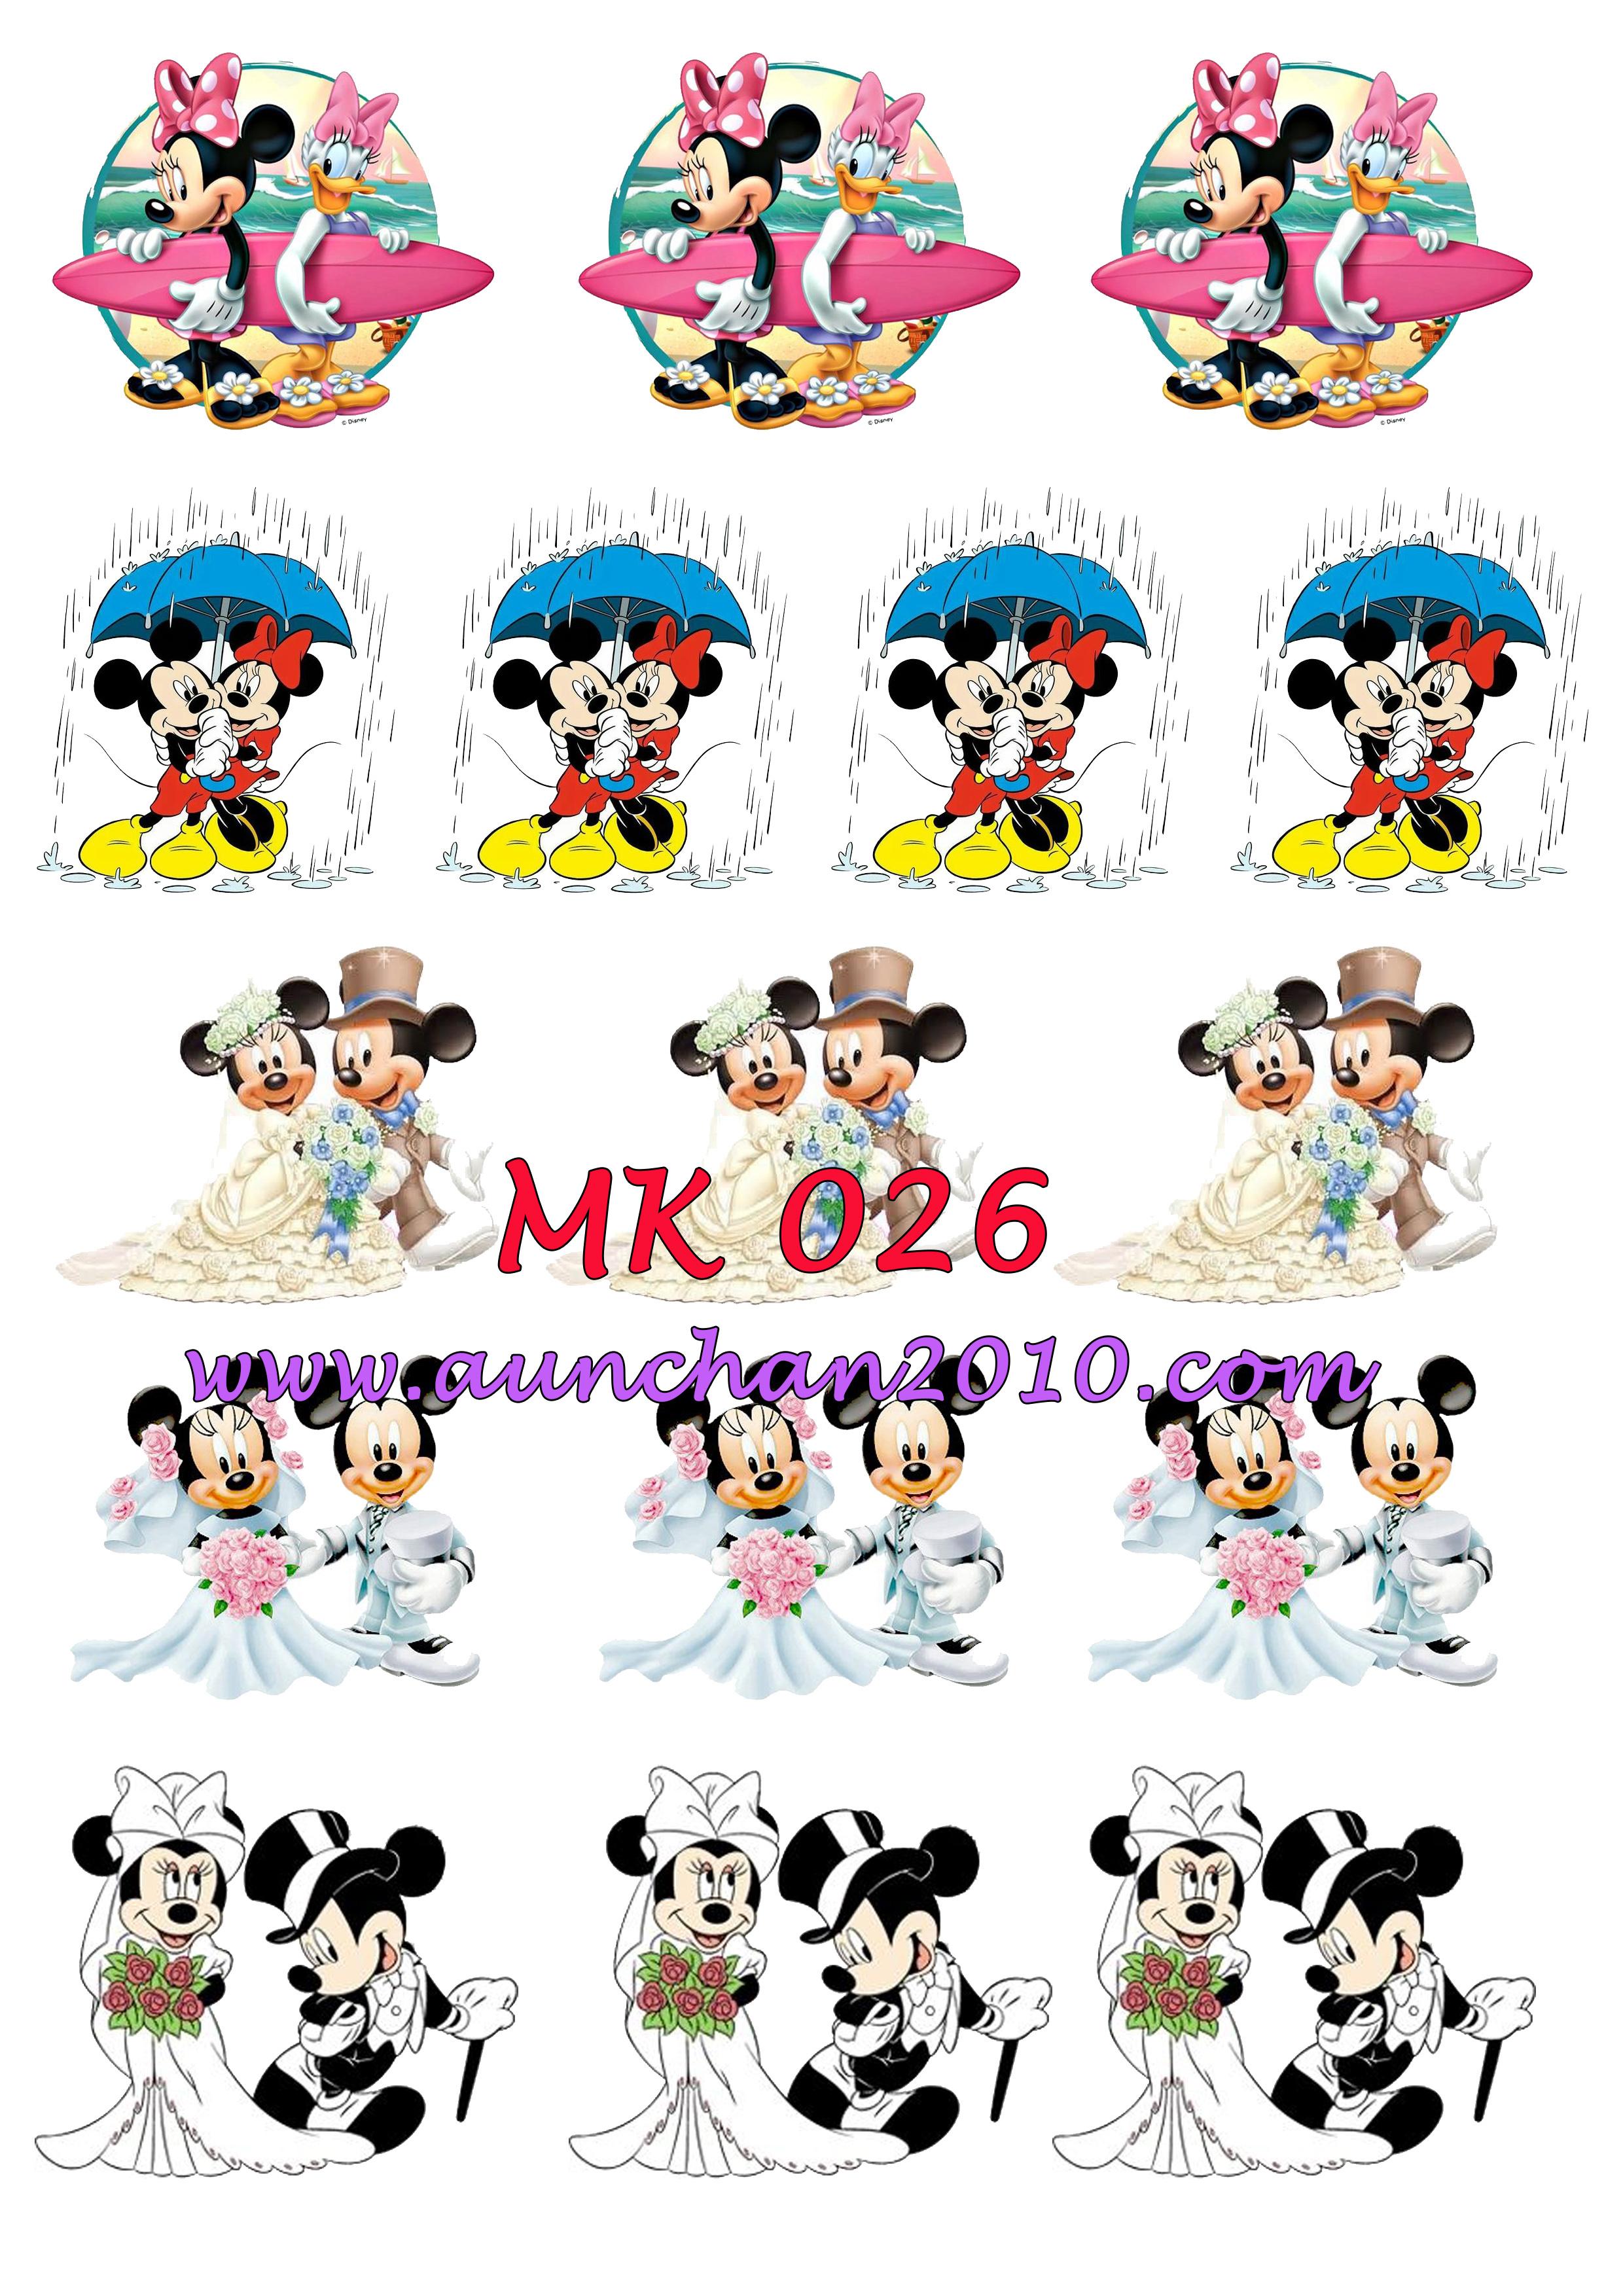 MK026 กระดาษแนพกิ้น 21x30ซม. ลายมิคกี้เม้าส์